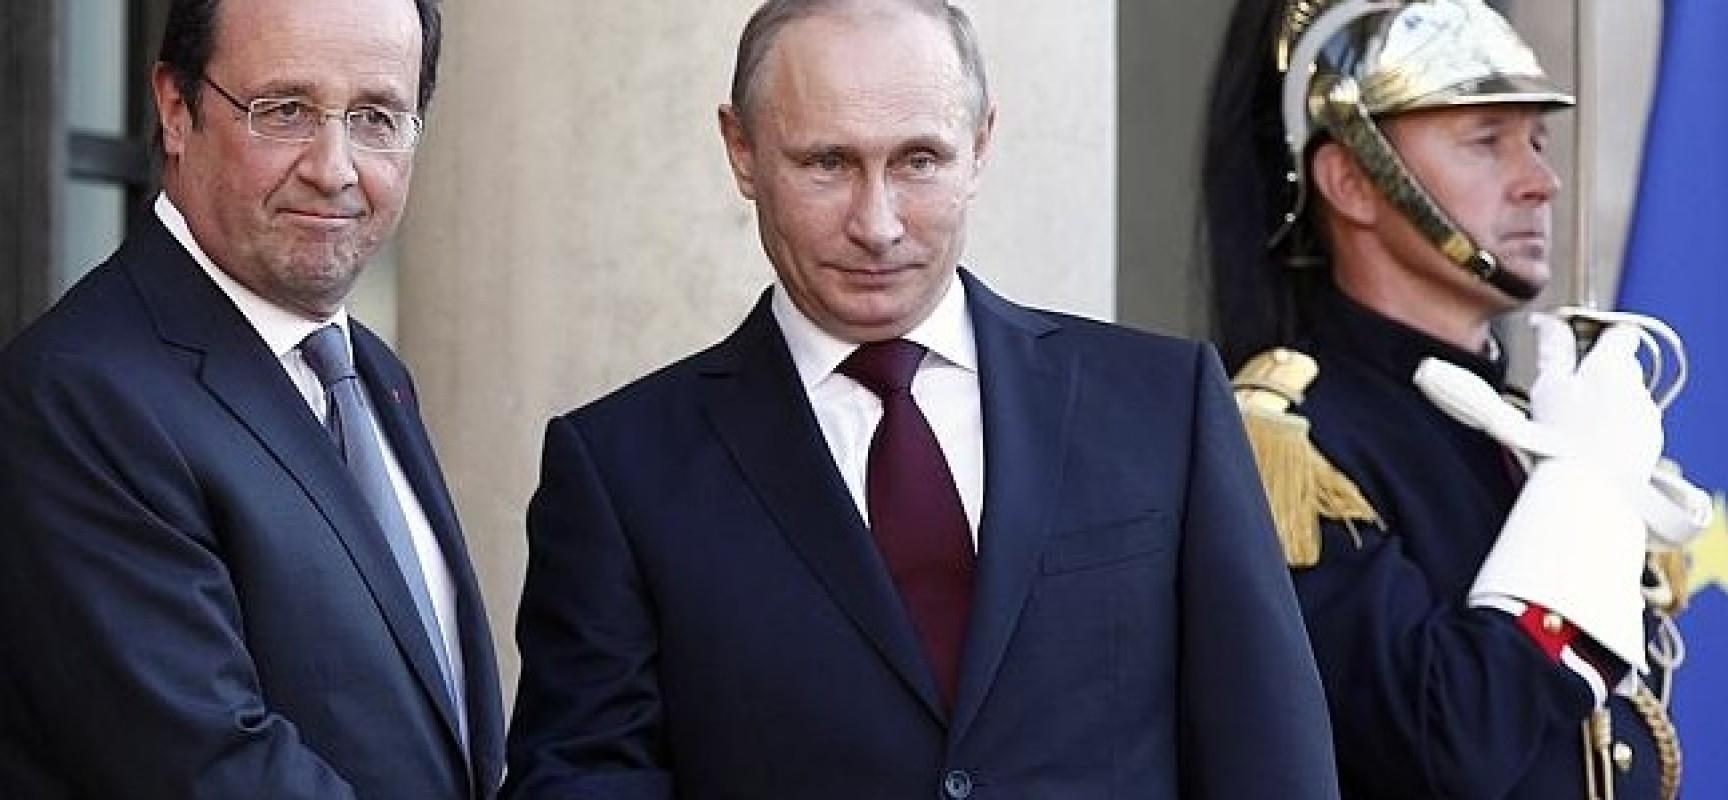 Gerald Celente – Europe Moving Away From U.S. After Ukraine Fiasco